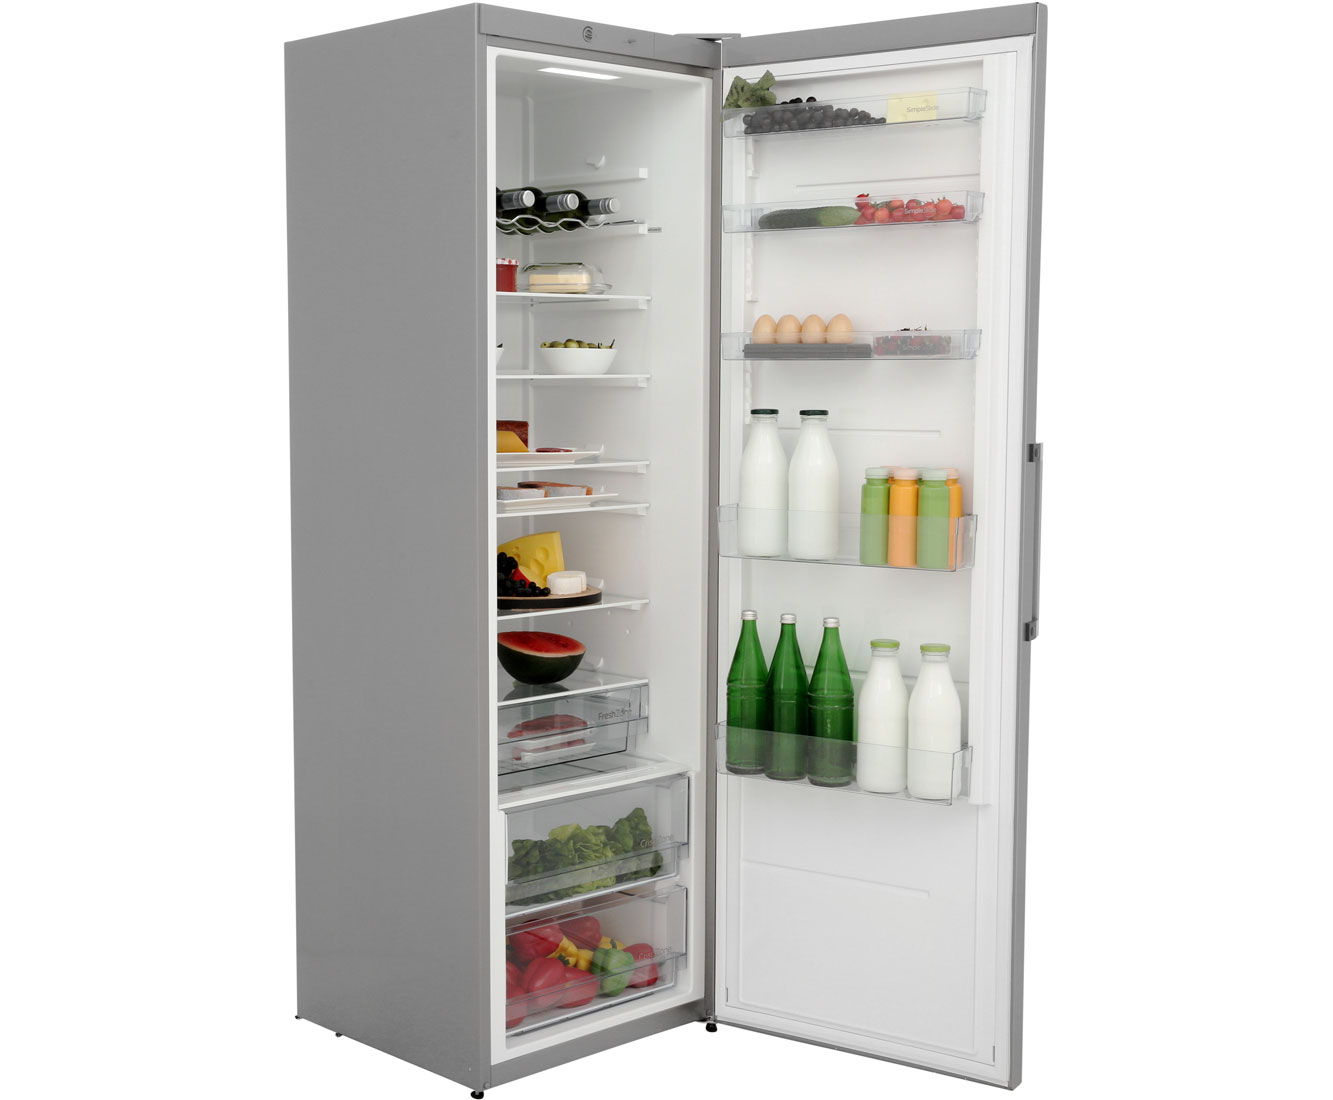 Gorenje Kühlschrank Test : Gorenje r fx kühlschrank test: gorenje r6192fx køleskab youtube